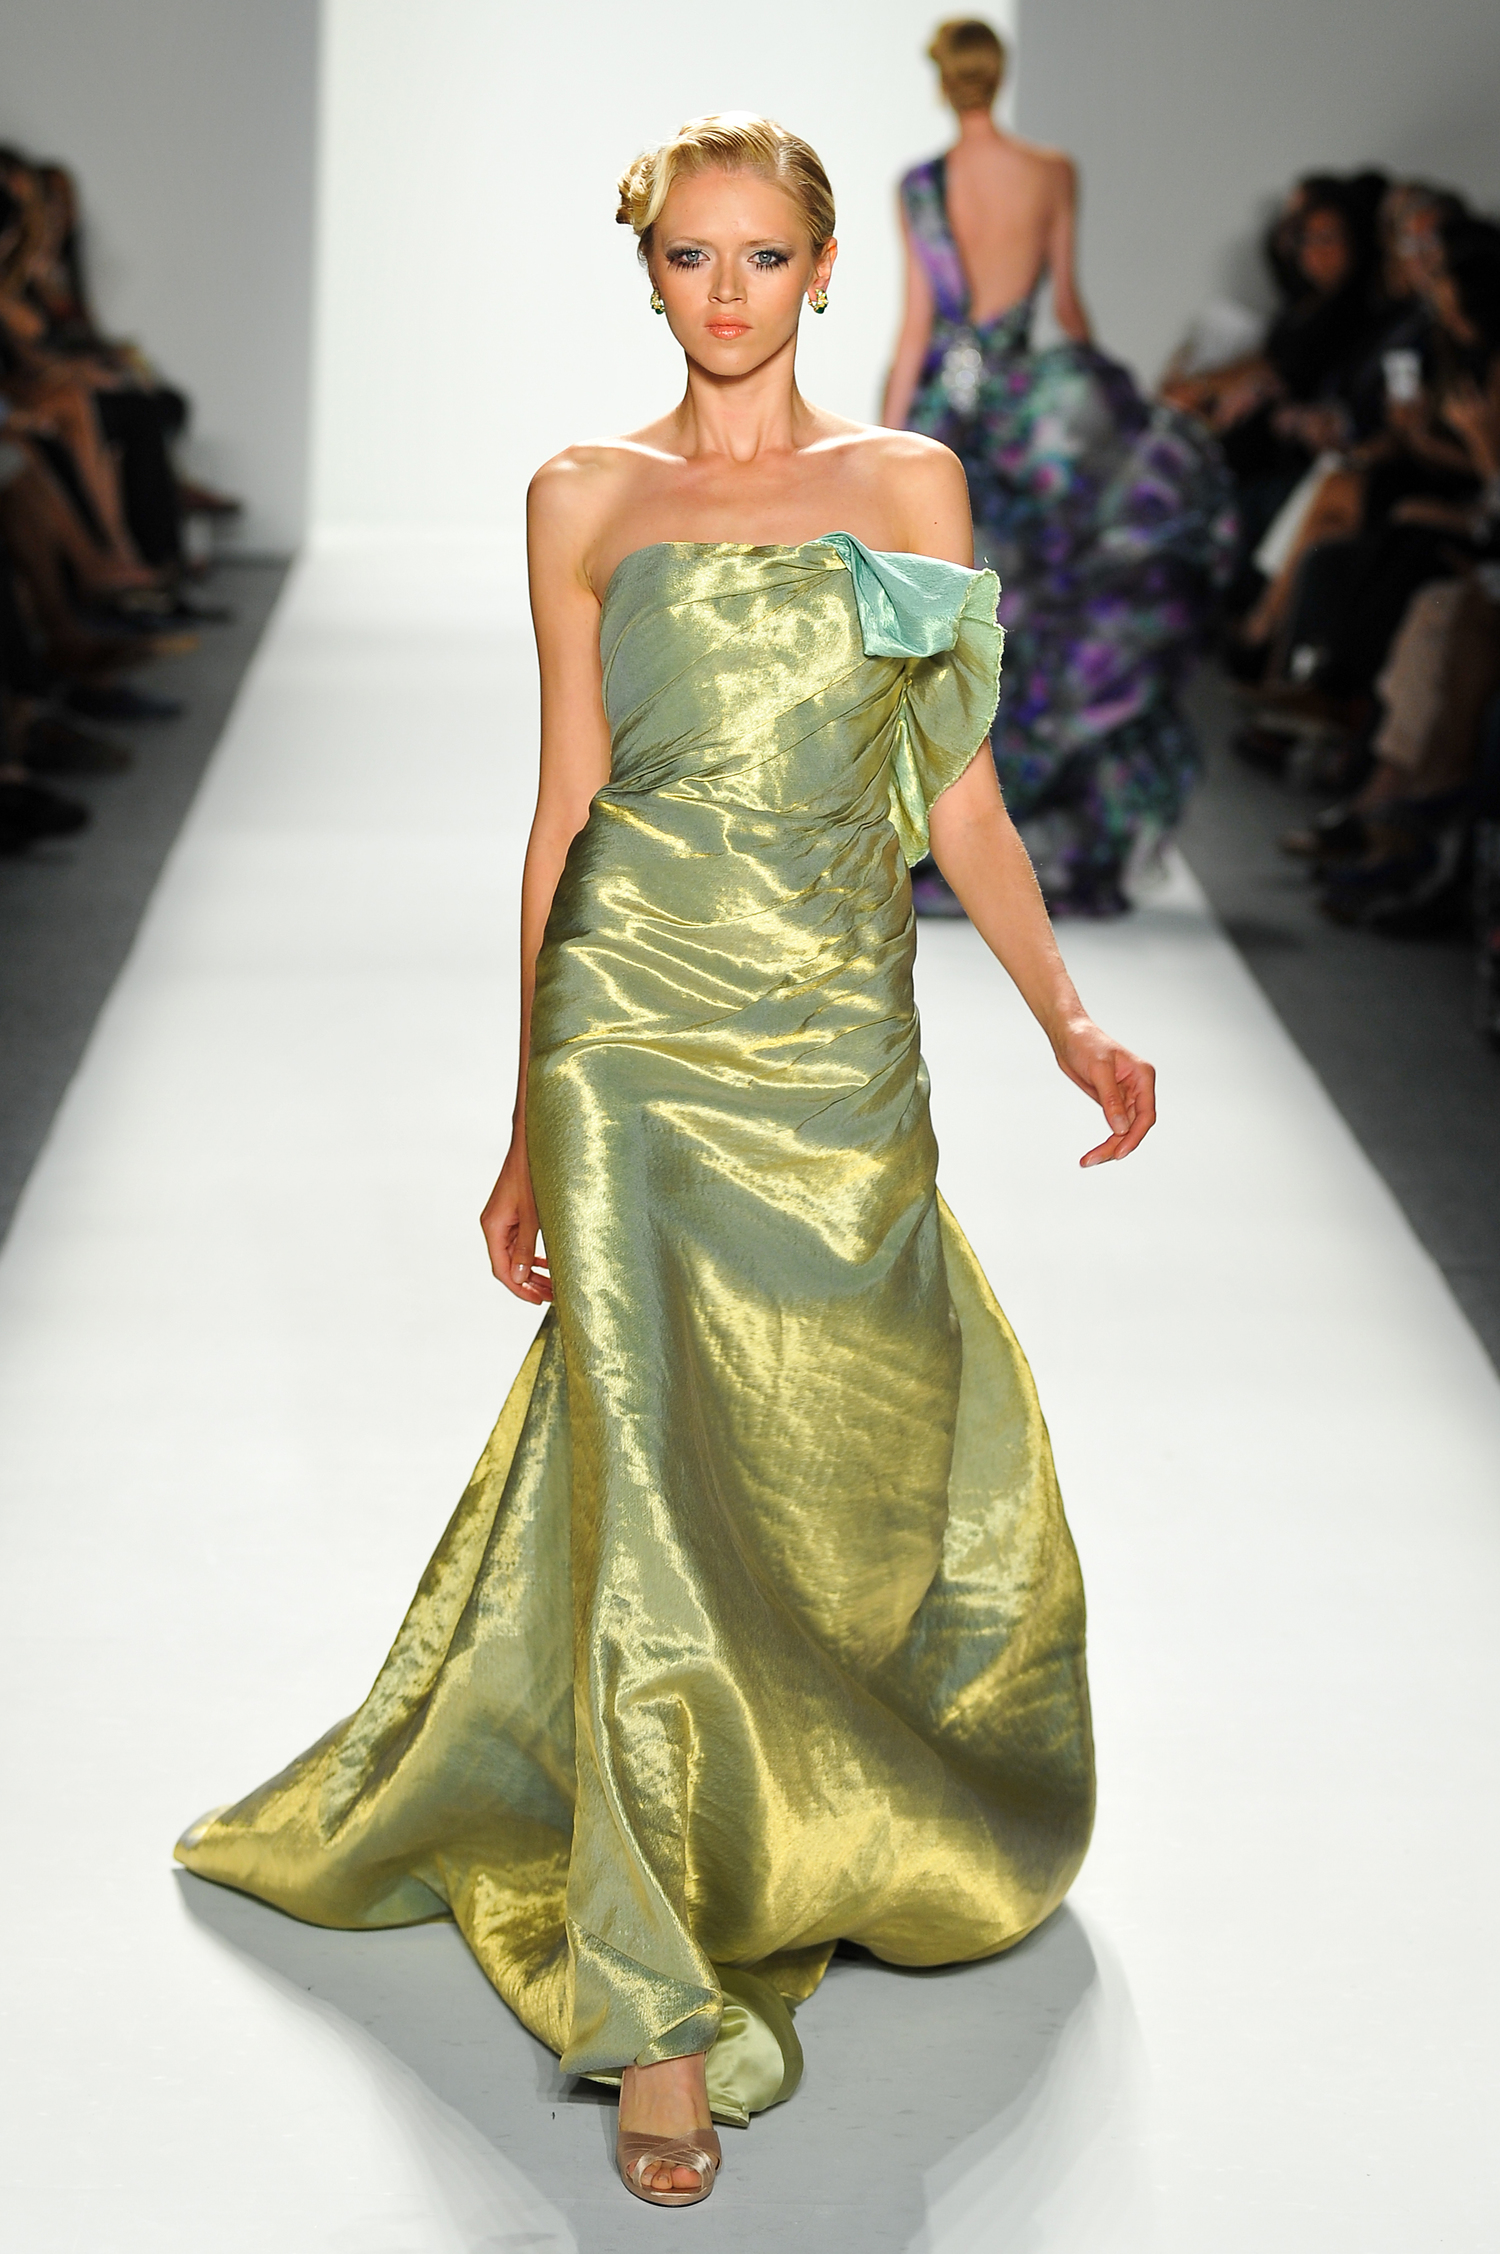 Metallic Gold/Aqua Evening Gown — Globa Moda